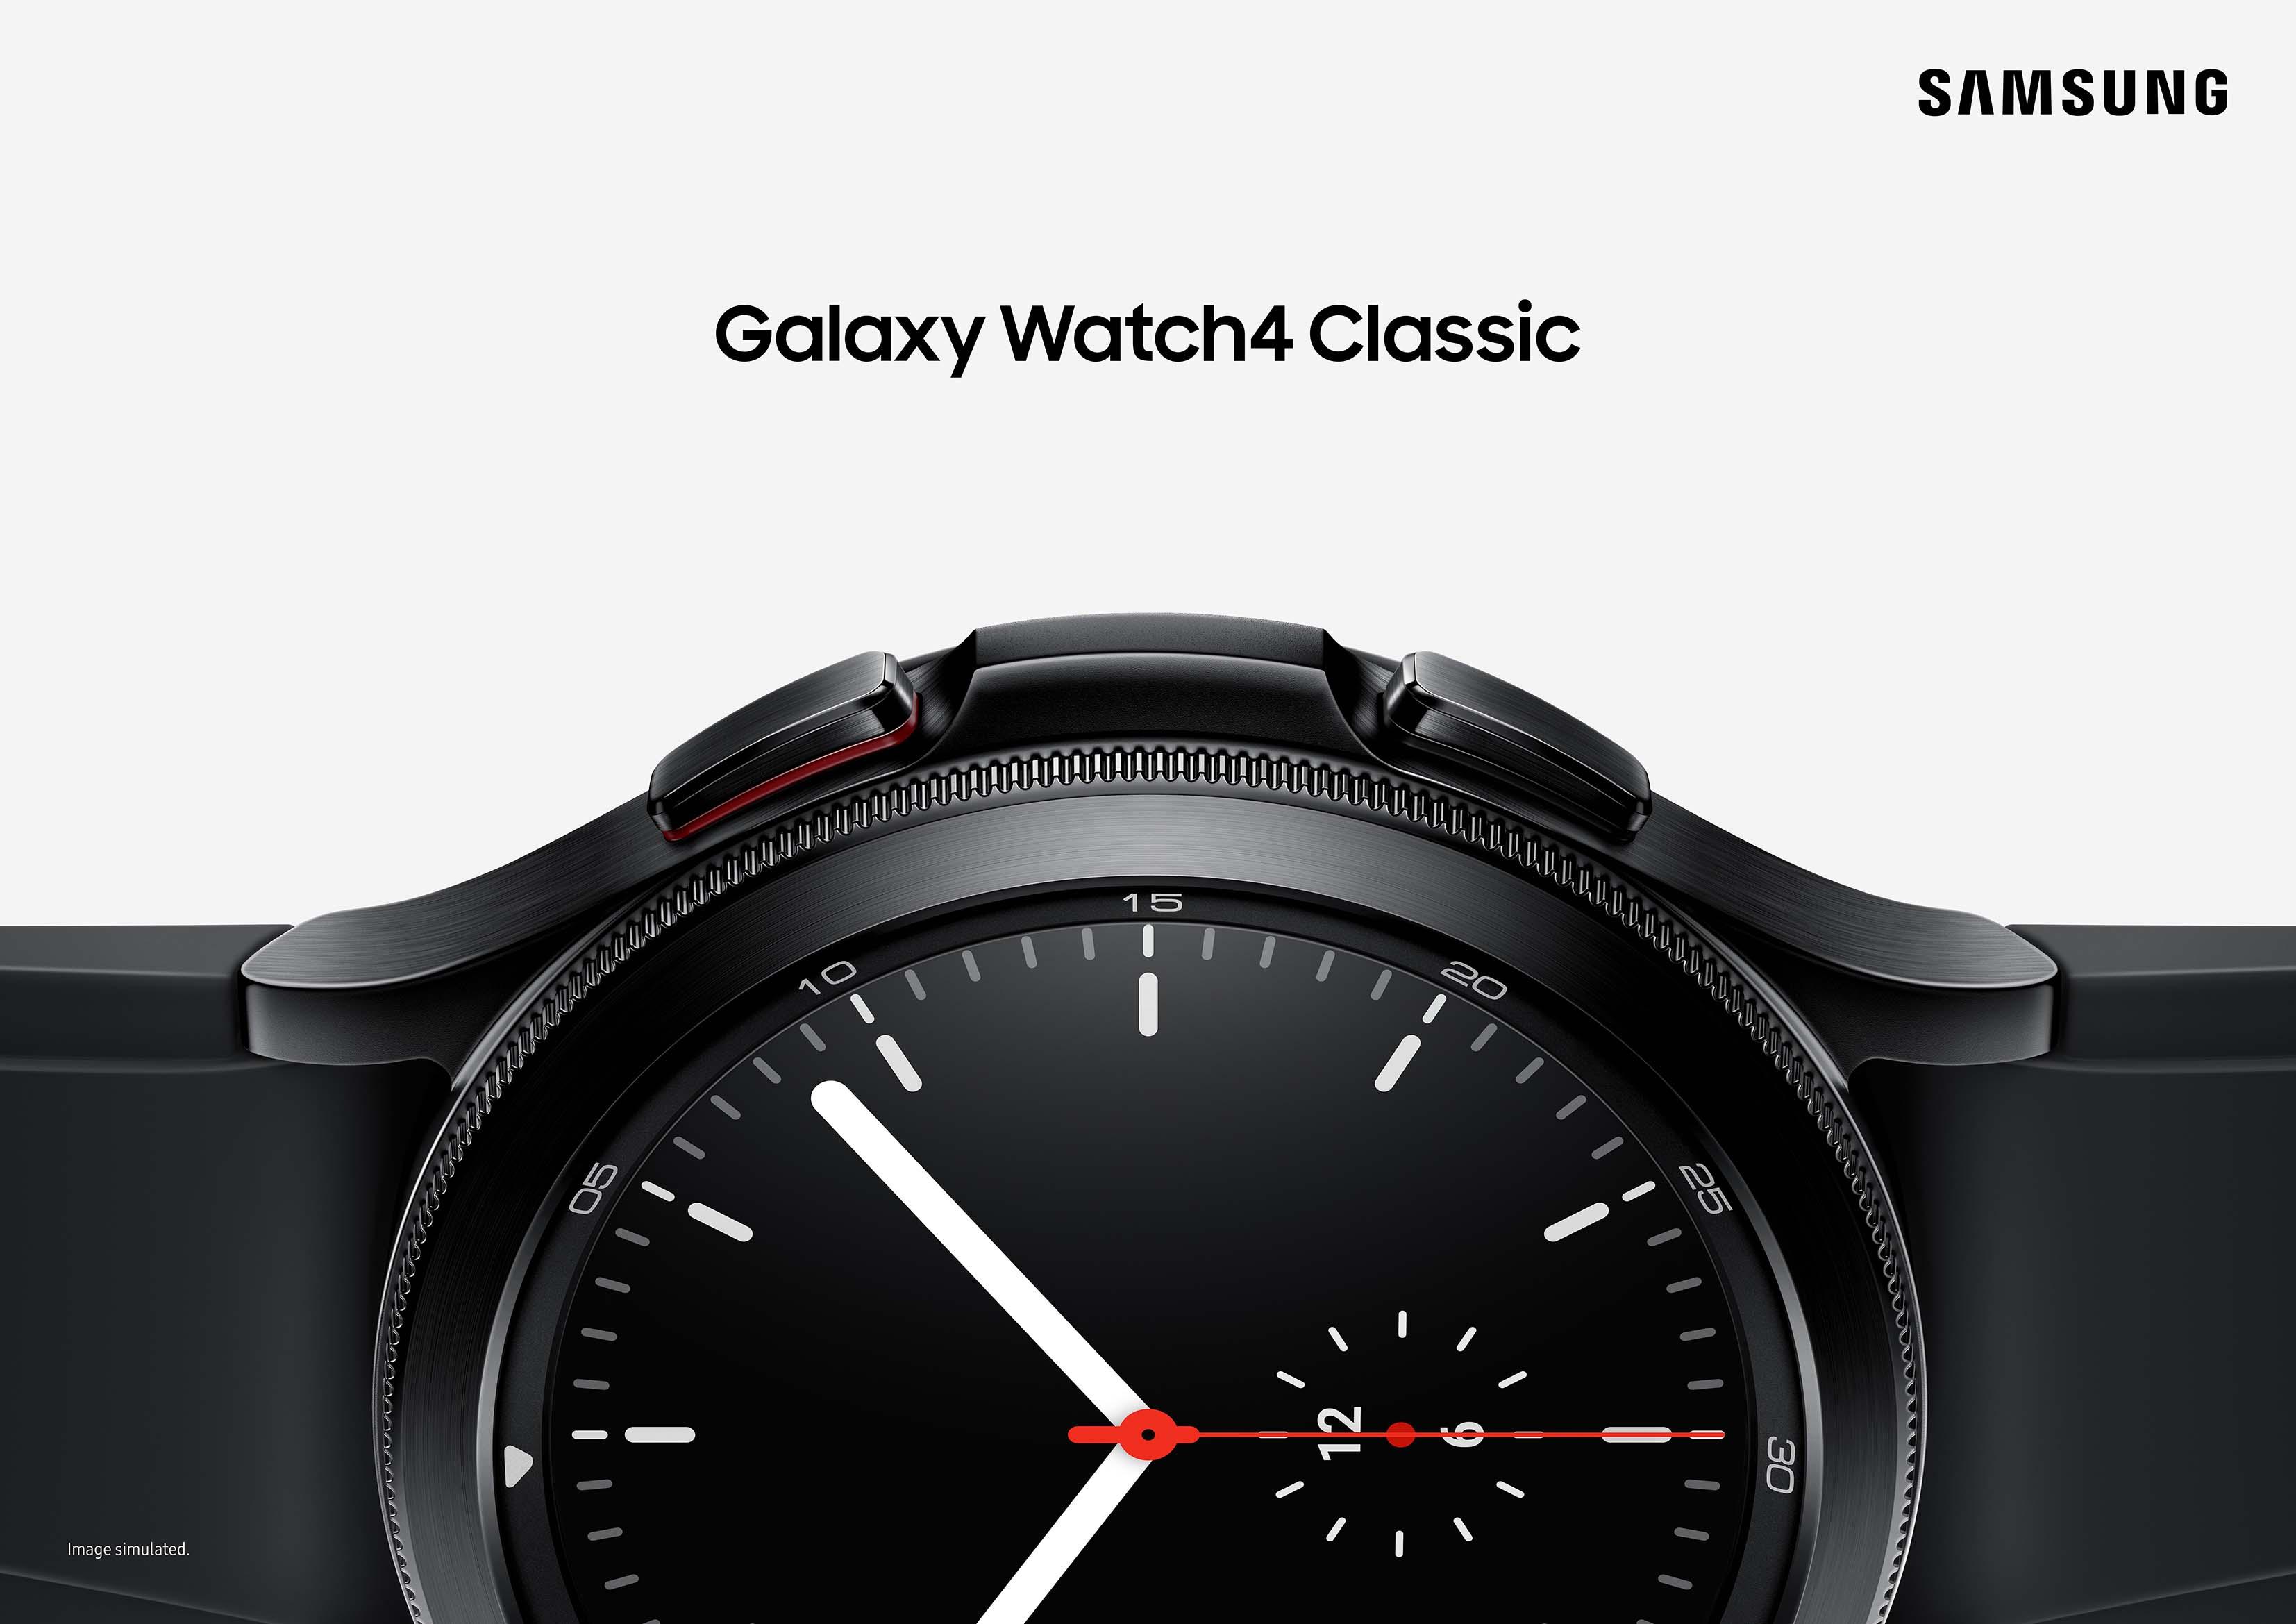 004 galaxywatch4classic black single kv white bg 2p